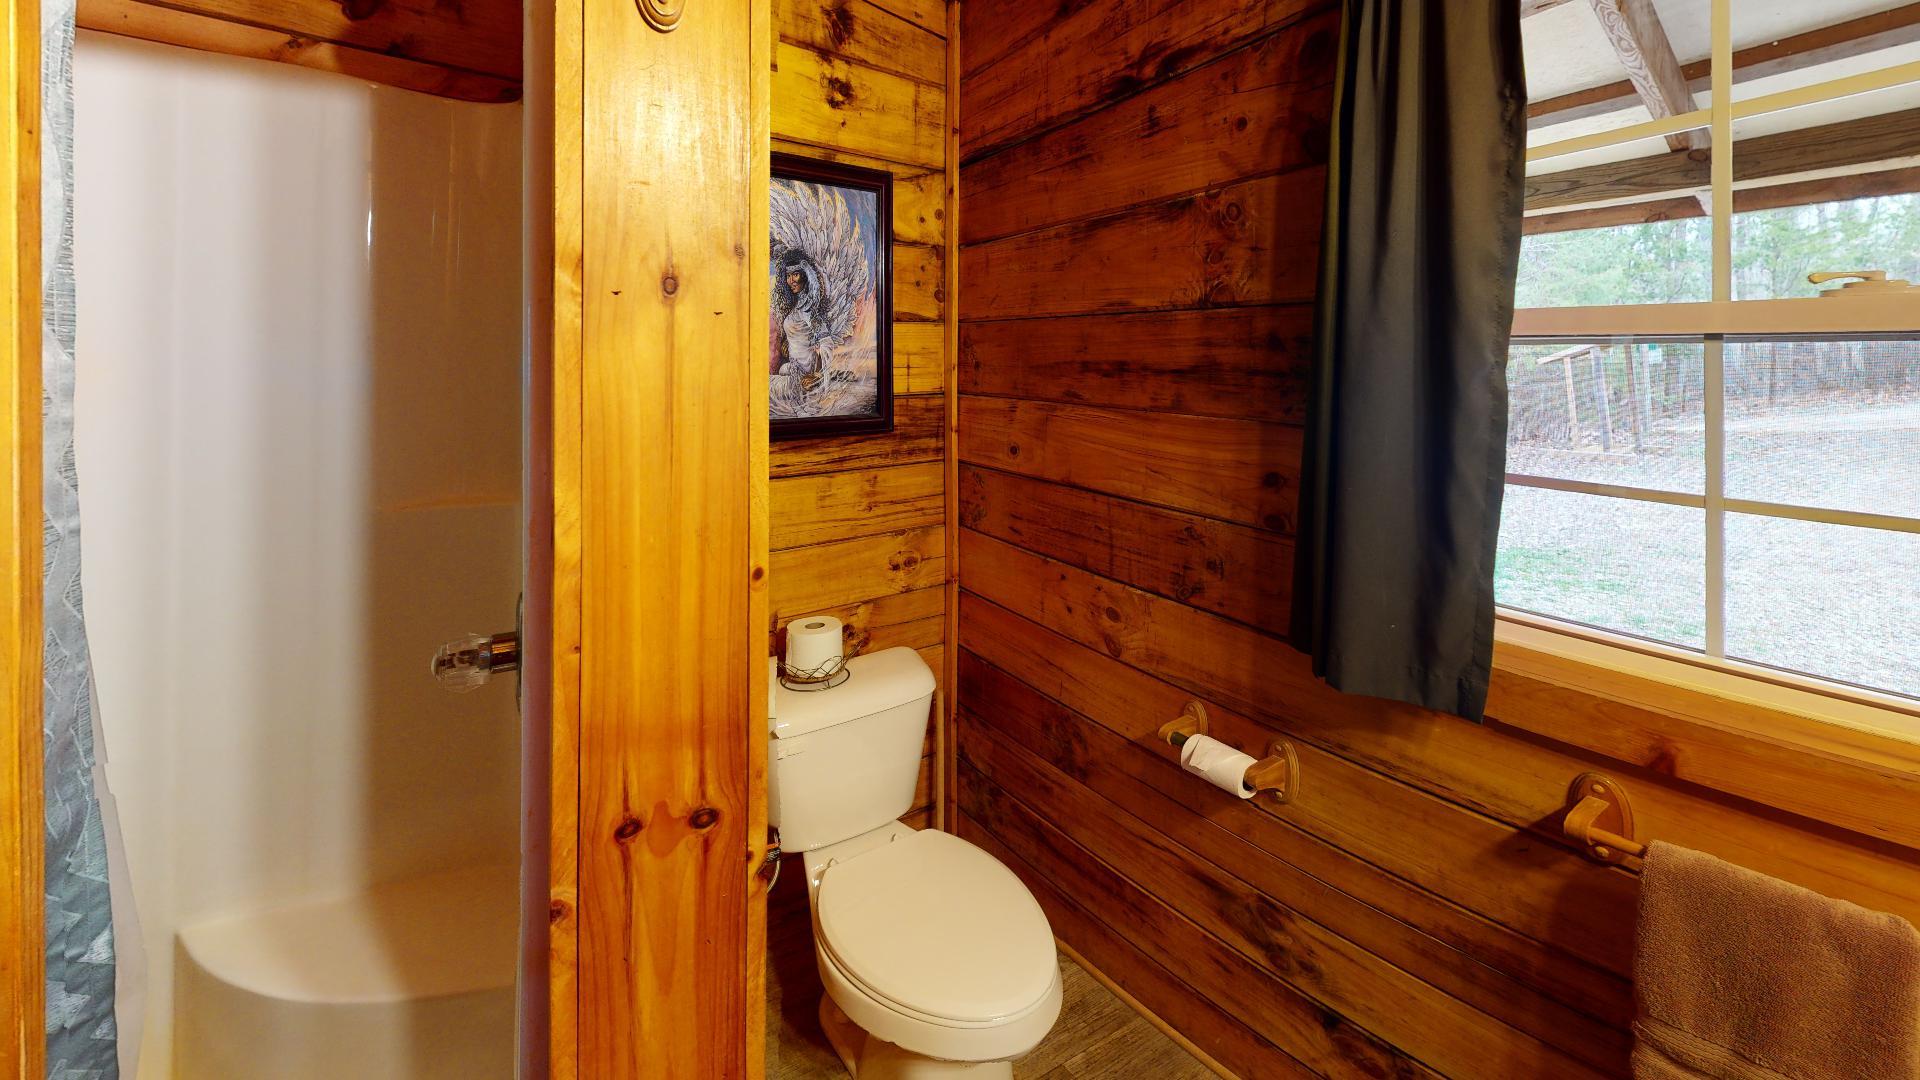 Photo 663_9202.jpg - Walk in shower and bathroom view.